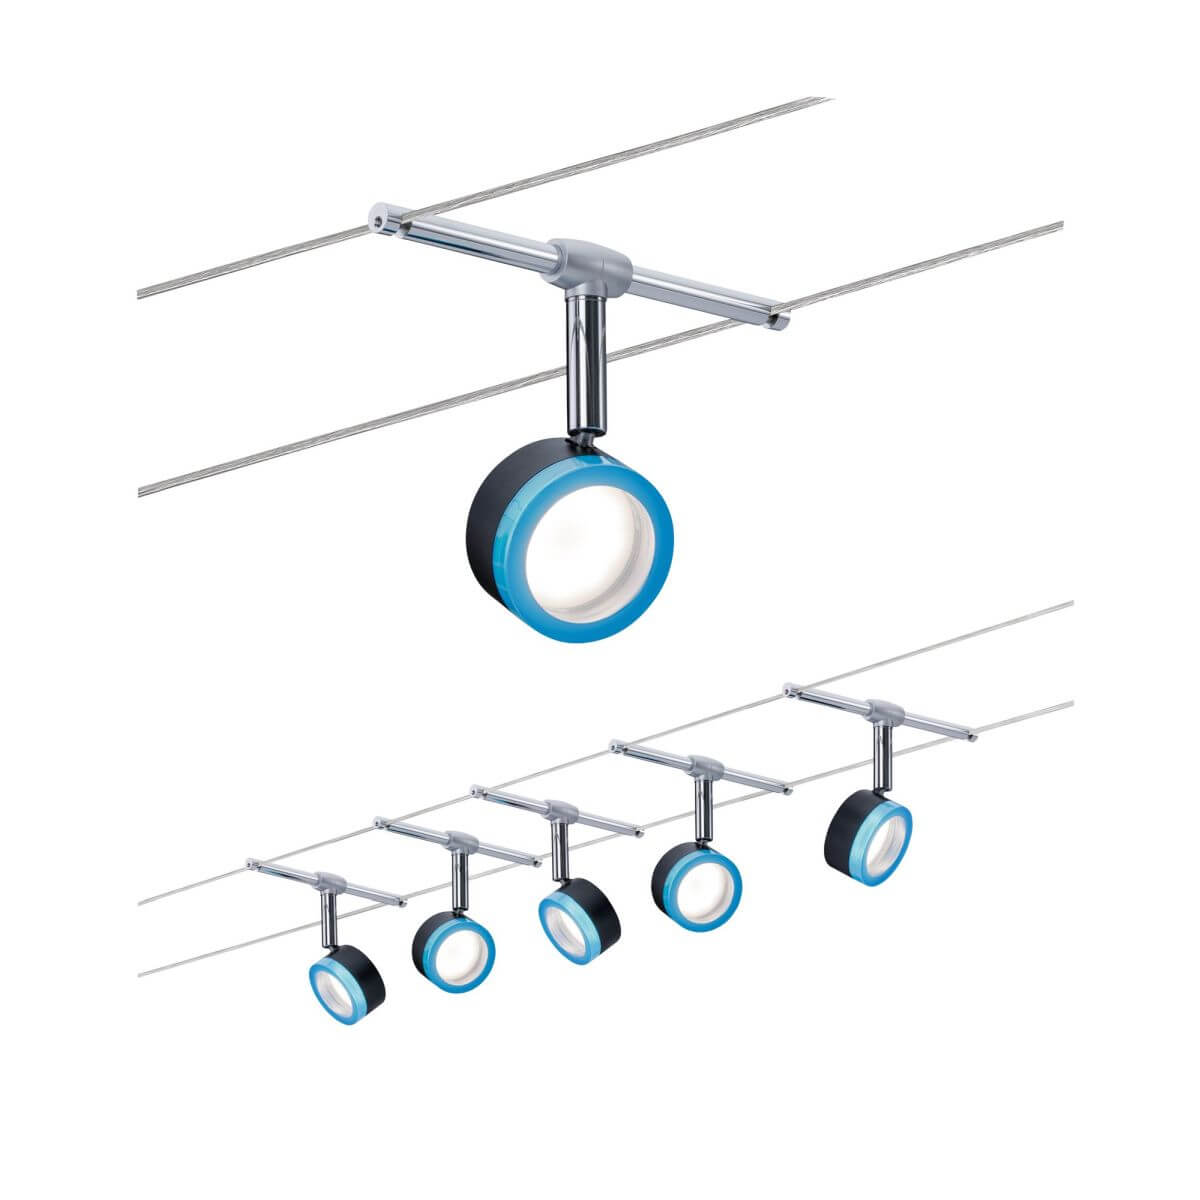 Paulmann Seilsystem BlueLED, 5 x 4W, 10 m, 2,5 mm², Warmweiß,  Blau | Chrom | Schwarz